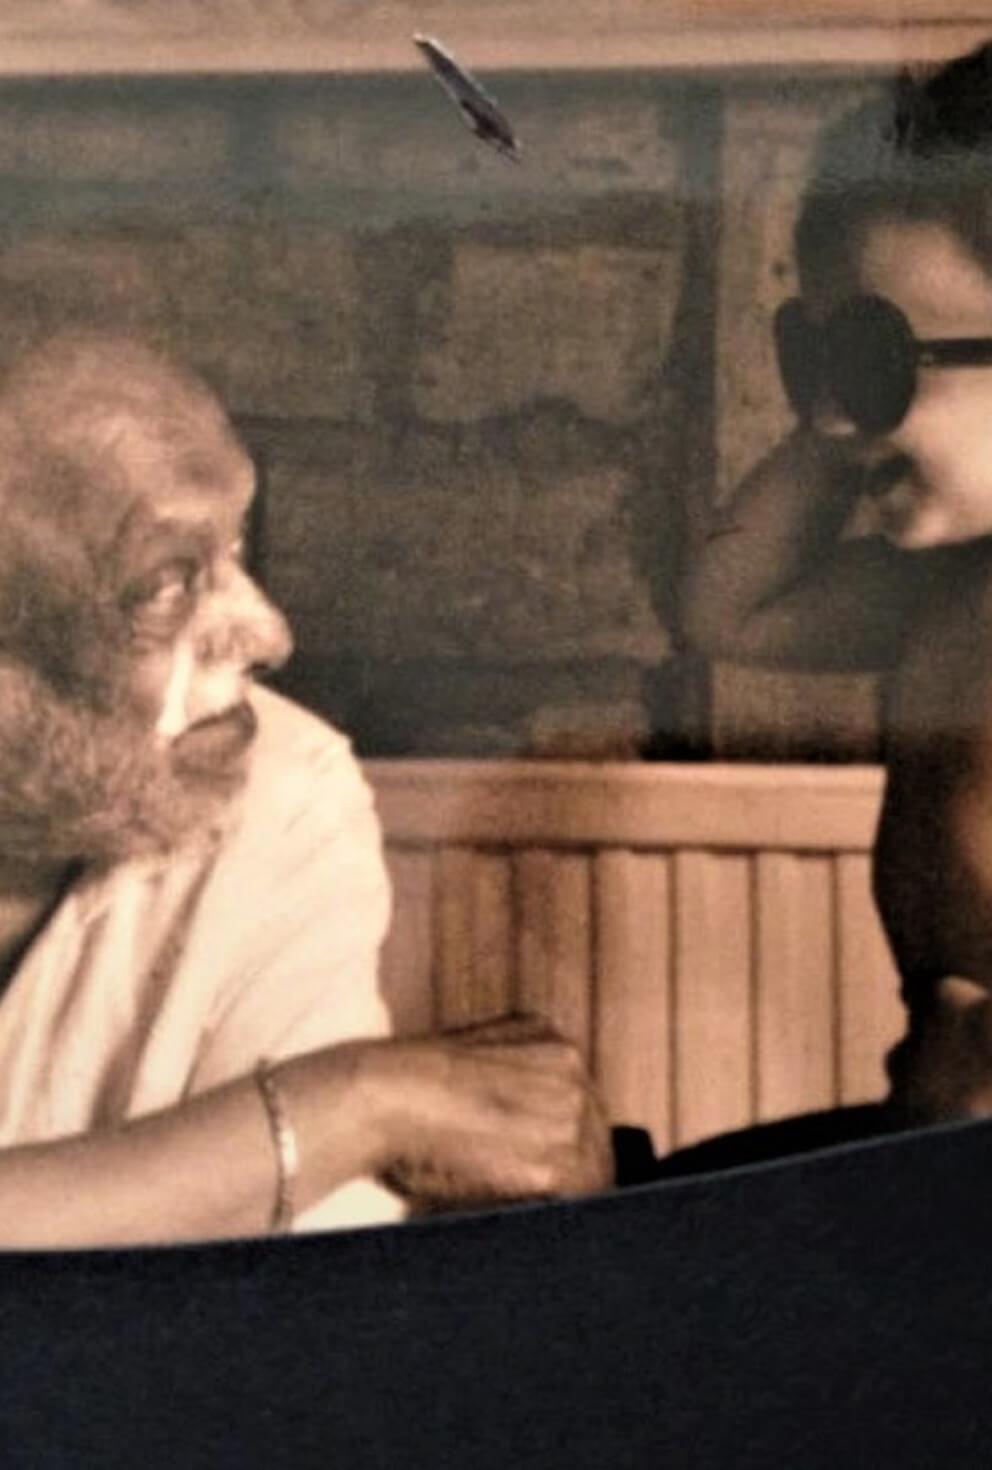 <em>Kin</em>dred spirits: in memory of my grandfather, FN Souza (1924-2002)